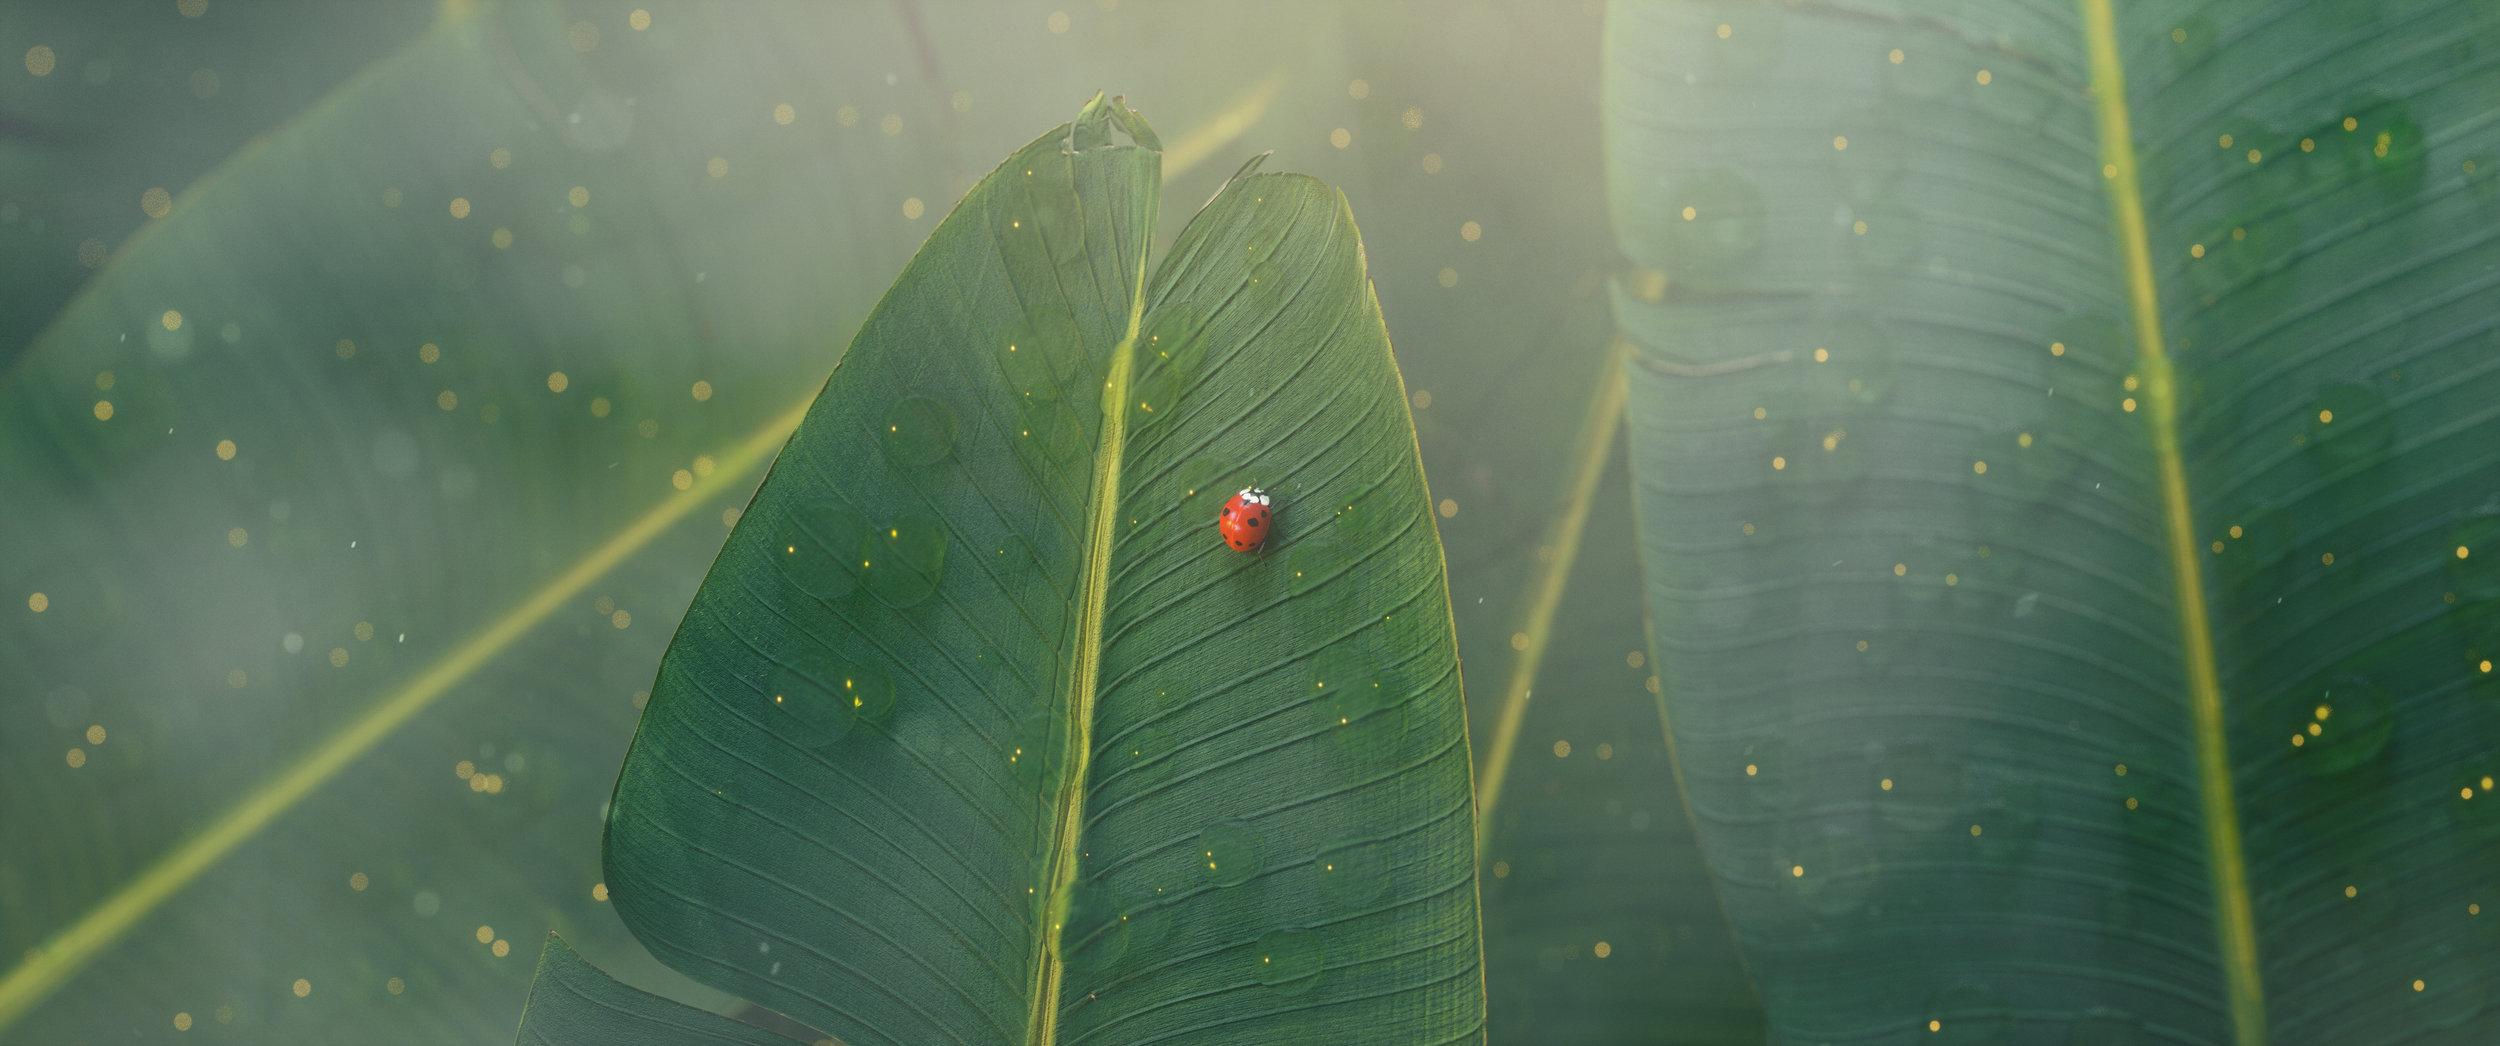 ladybug.002.jpg